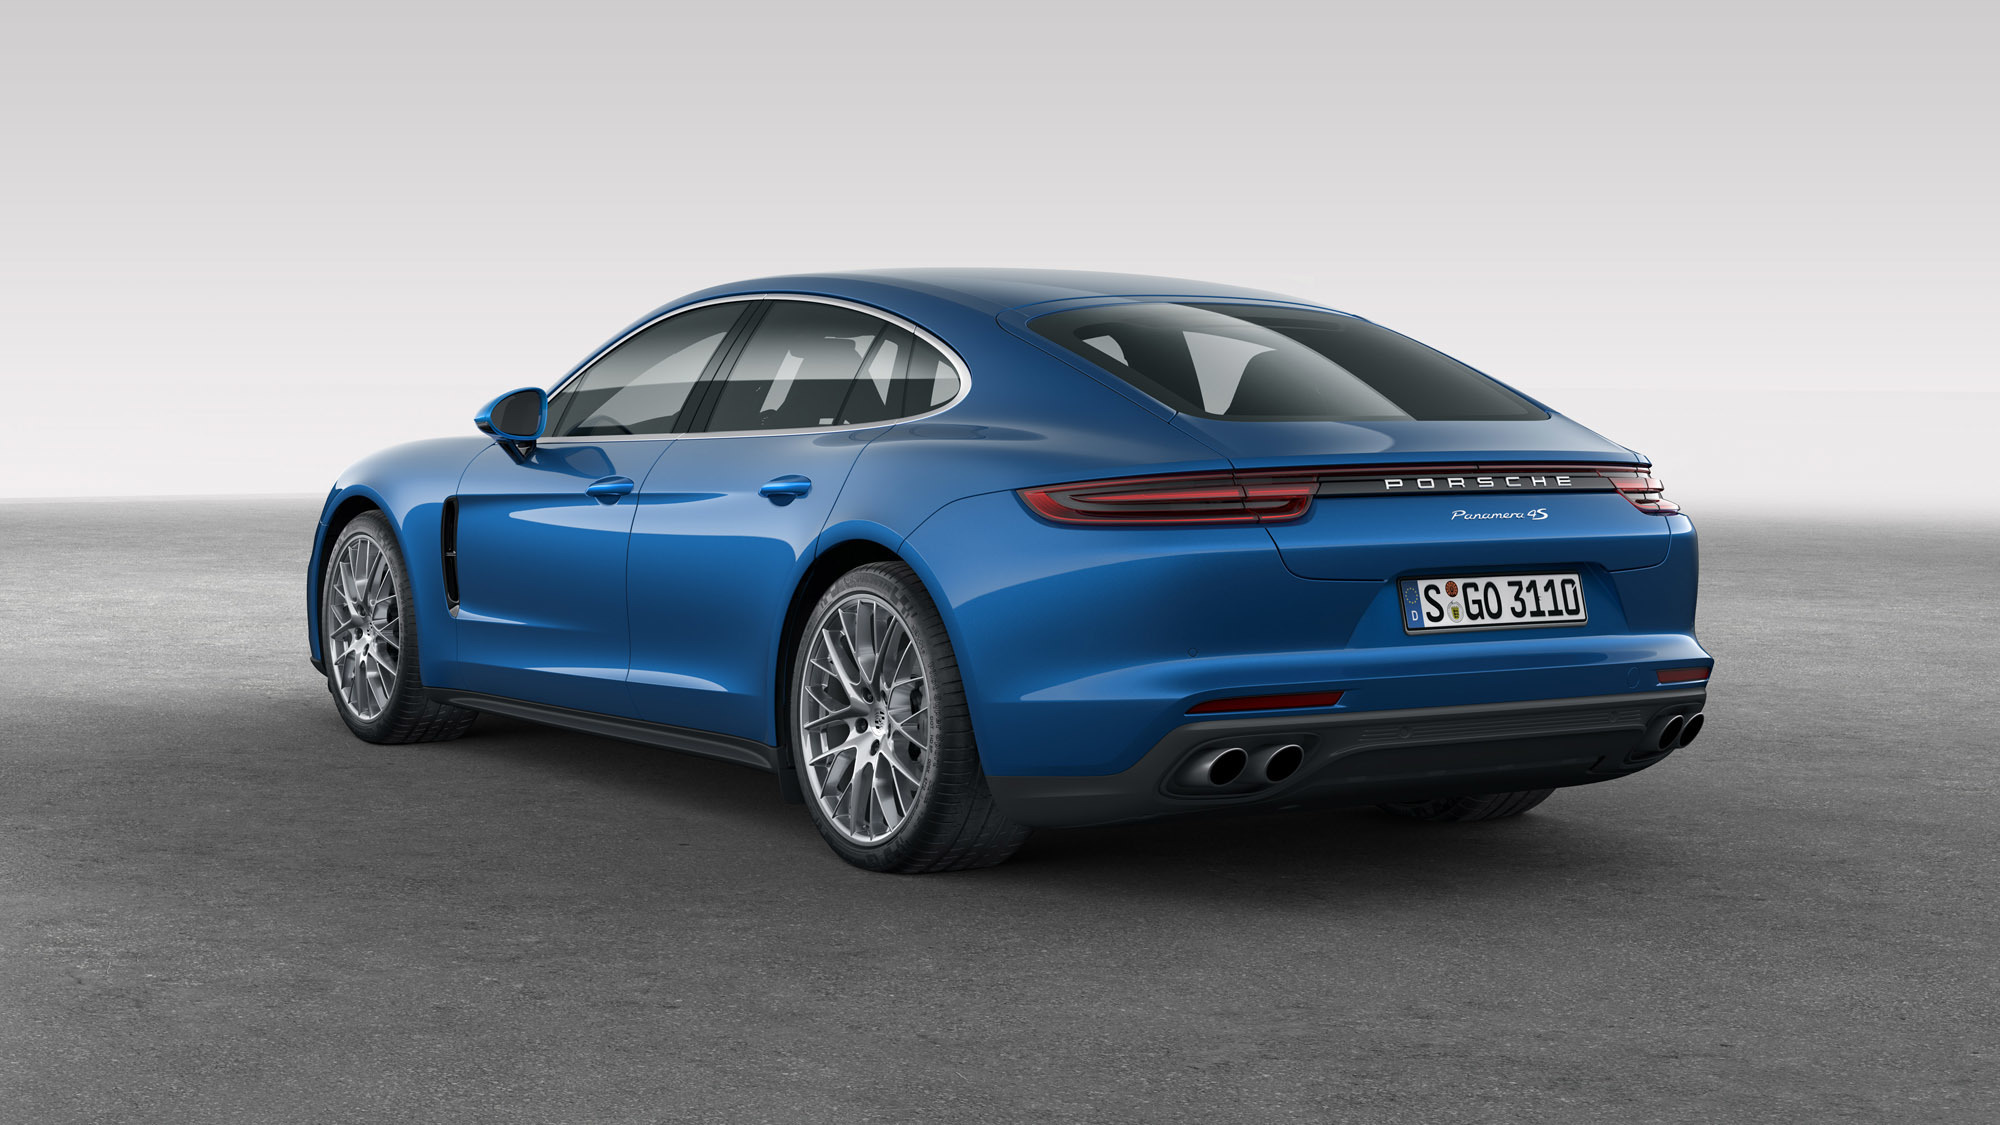 Porsche Panamera 2016 High Quality Wallpapers